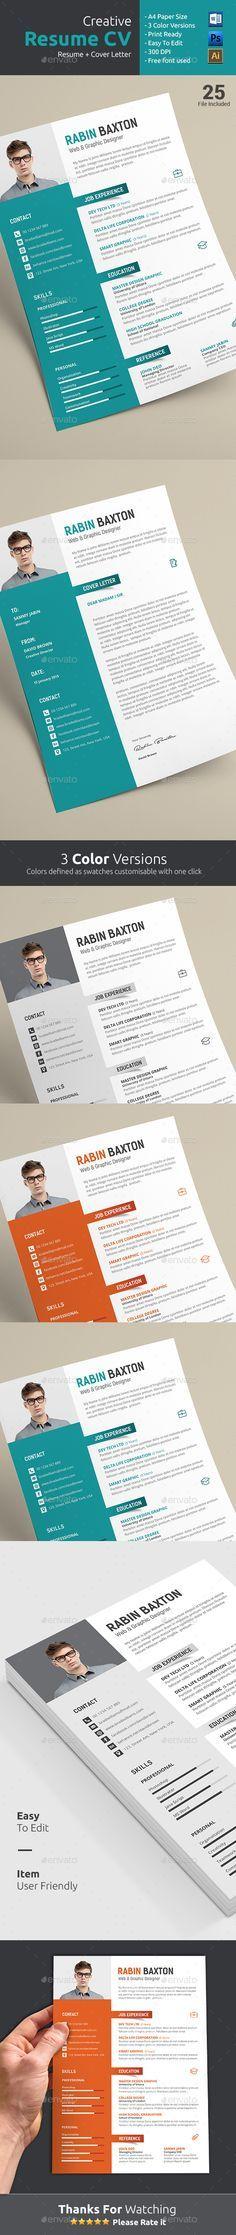 Resume 23 best Creative CVu0027s u0026 Resume